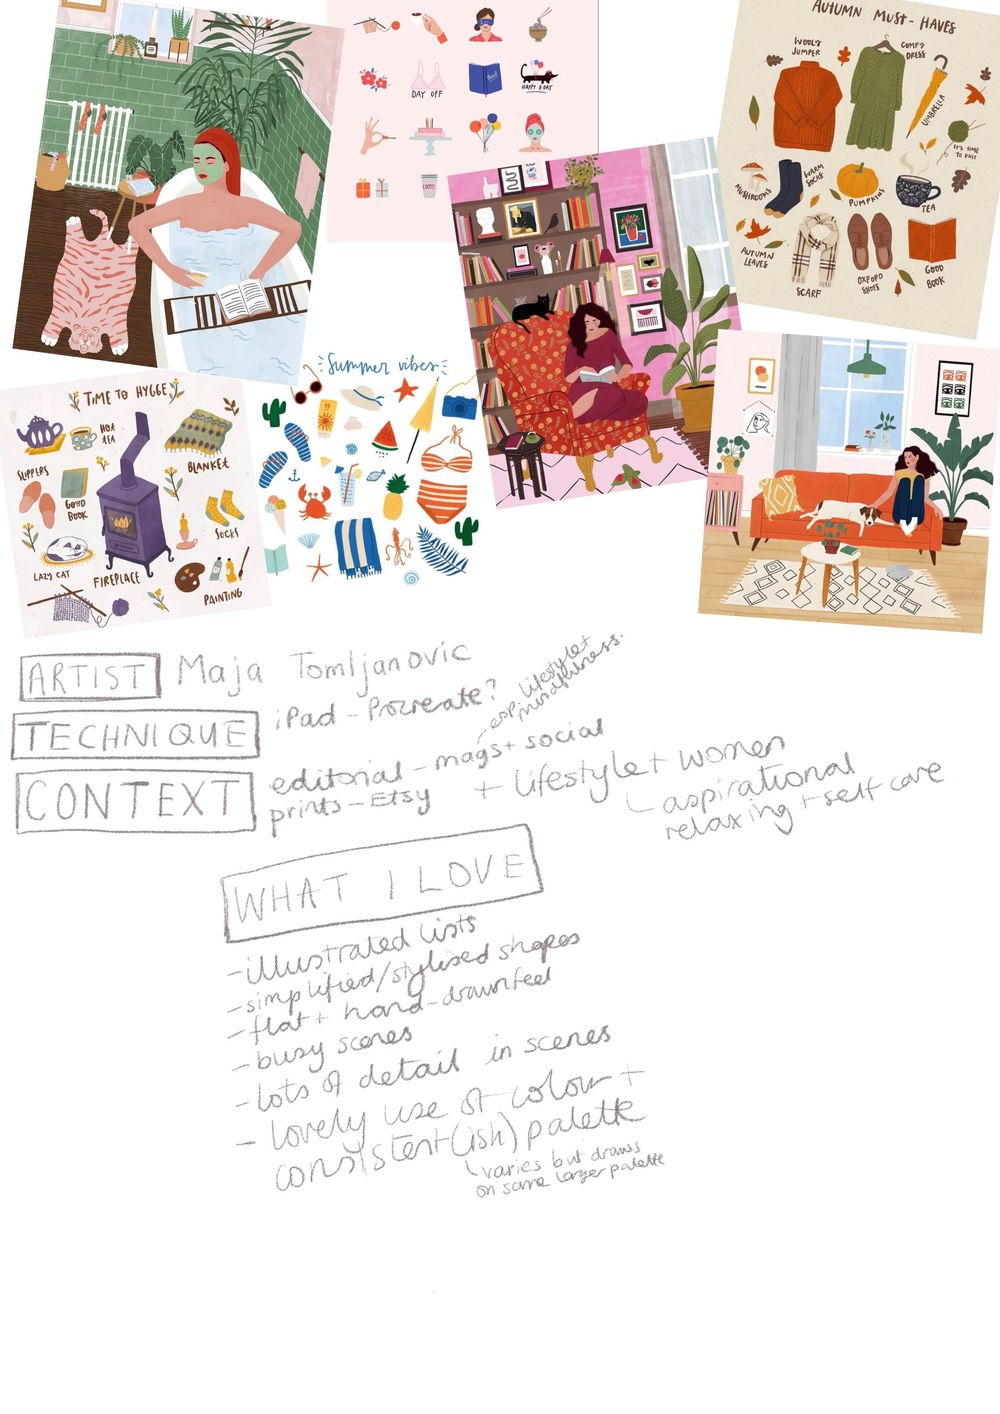 Tasha Goddard Style Class - image 8 - student project